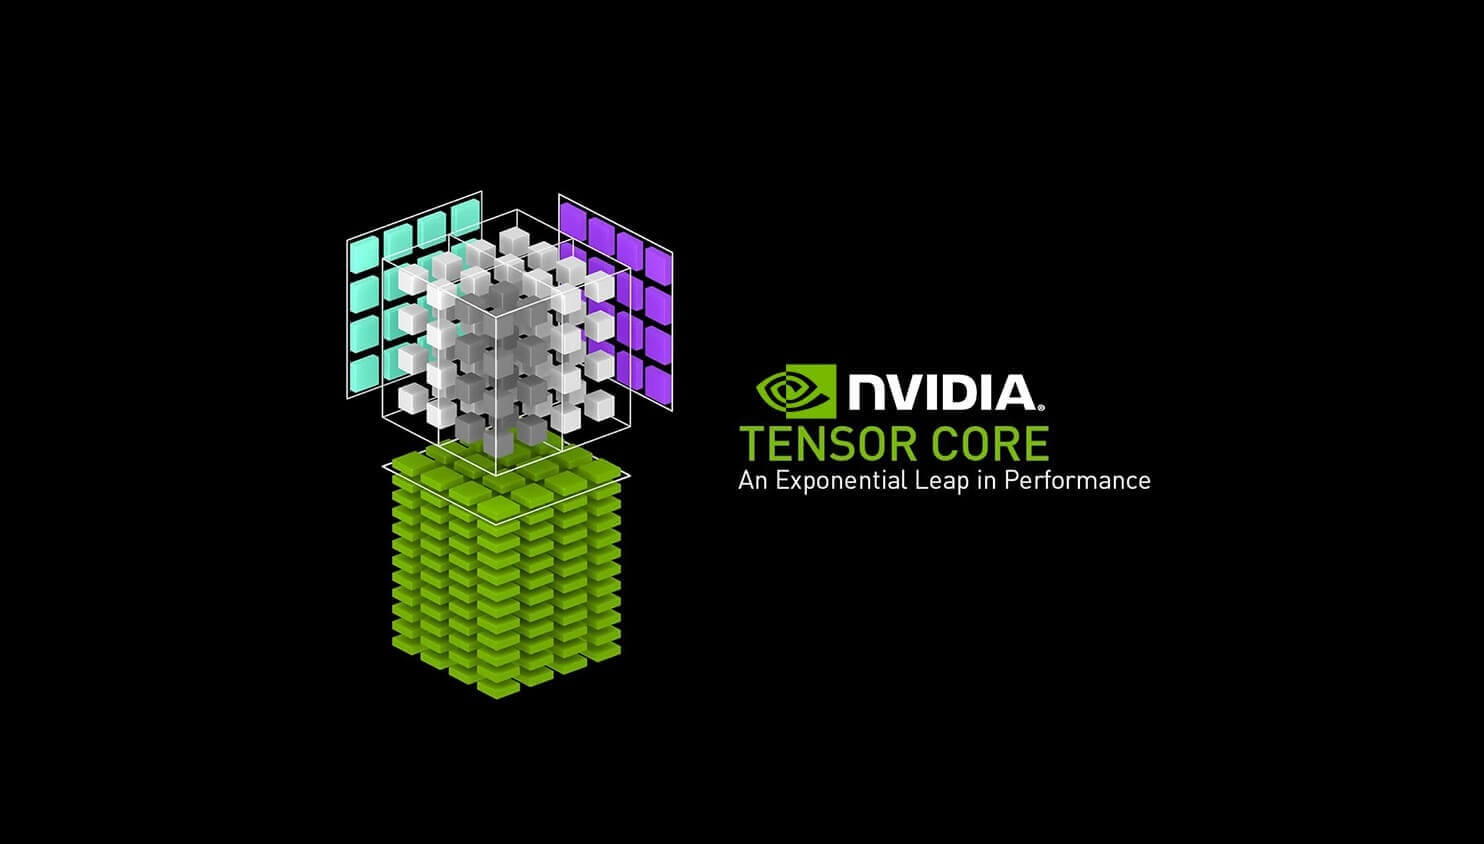 Nvidia's Tensor Cores